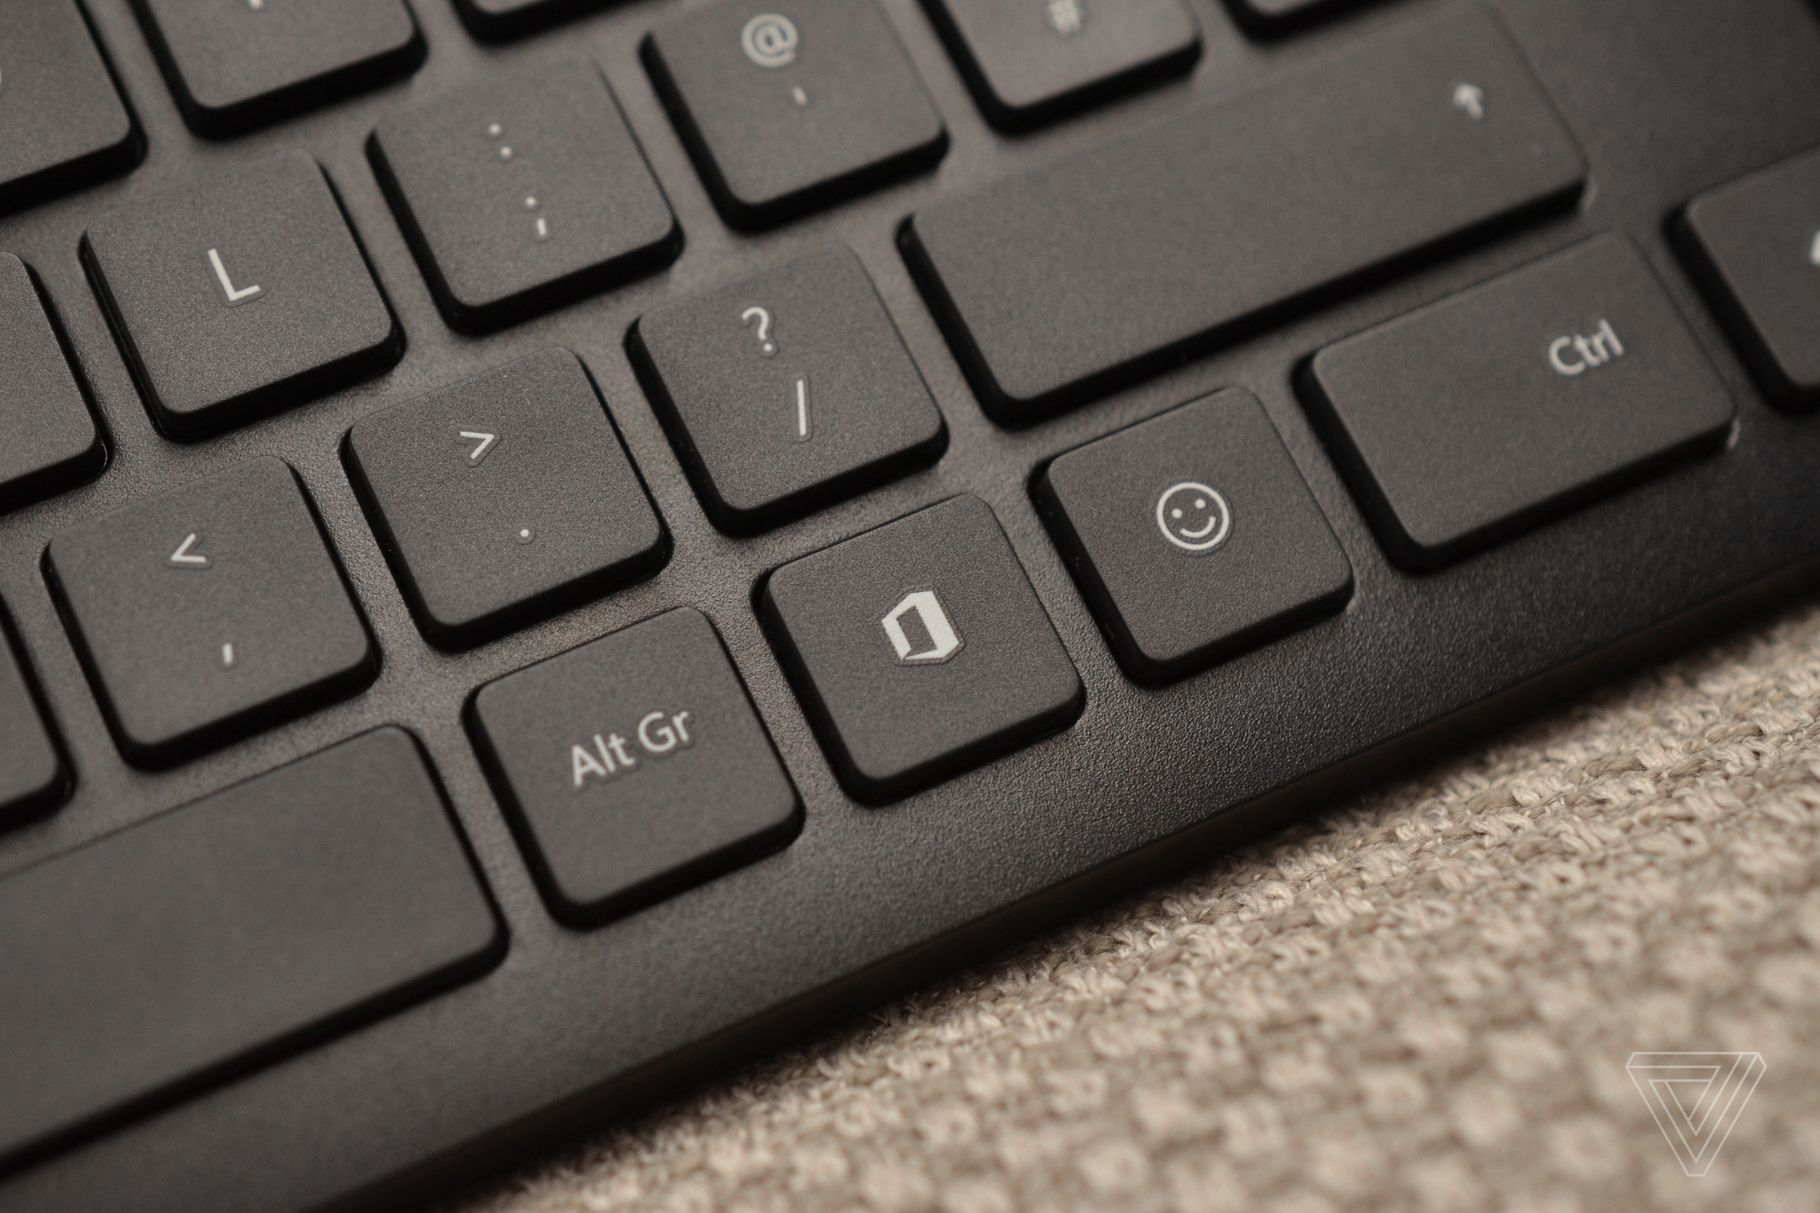 Microsoft has dedicated Office and emoji keys on its new keyboards